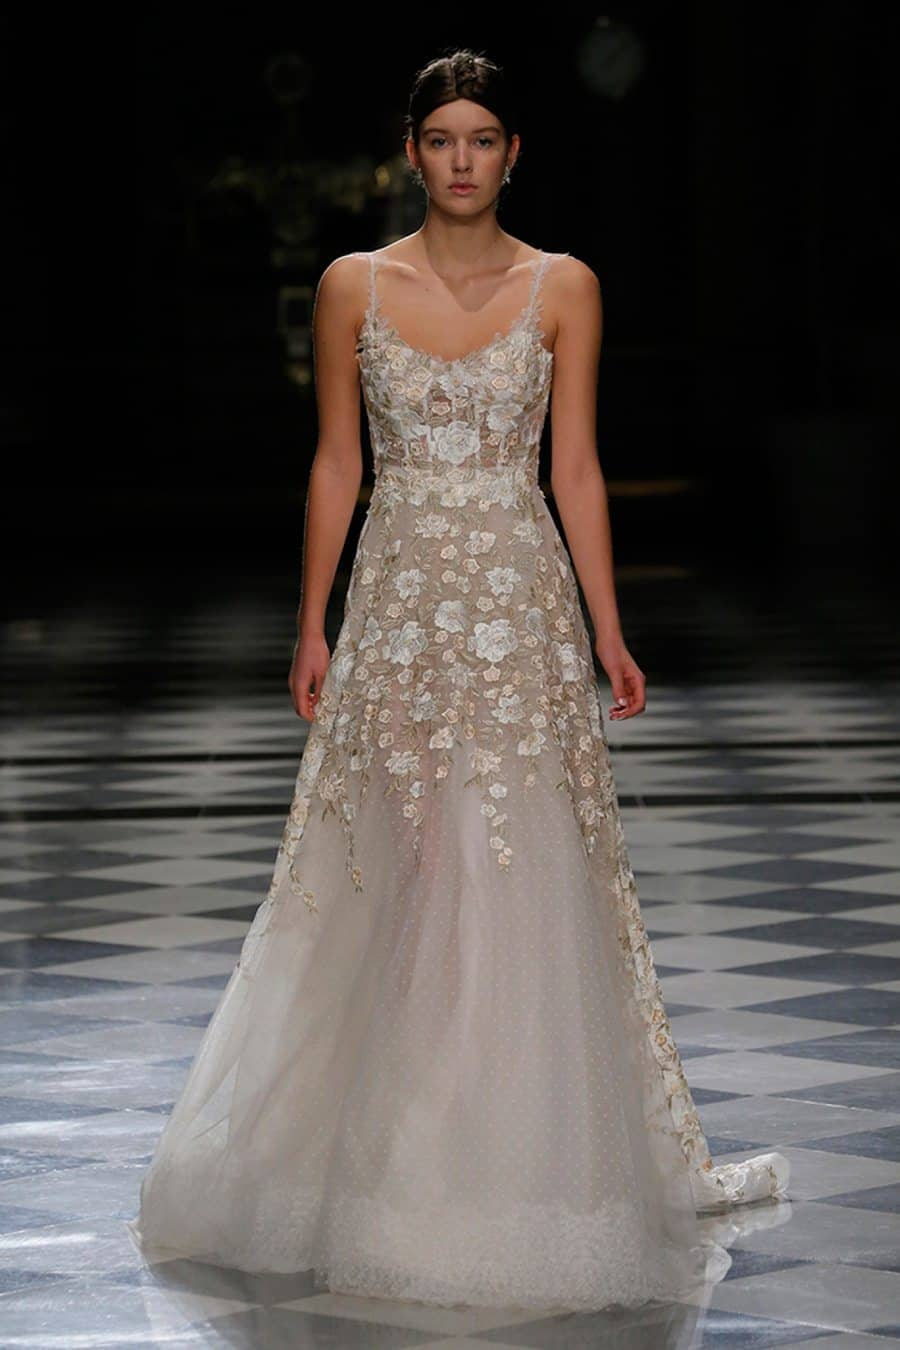 bride-high-fashion-couture-weddingdress-wedding-bridedress-couturedress-highfashion-yolancris-81